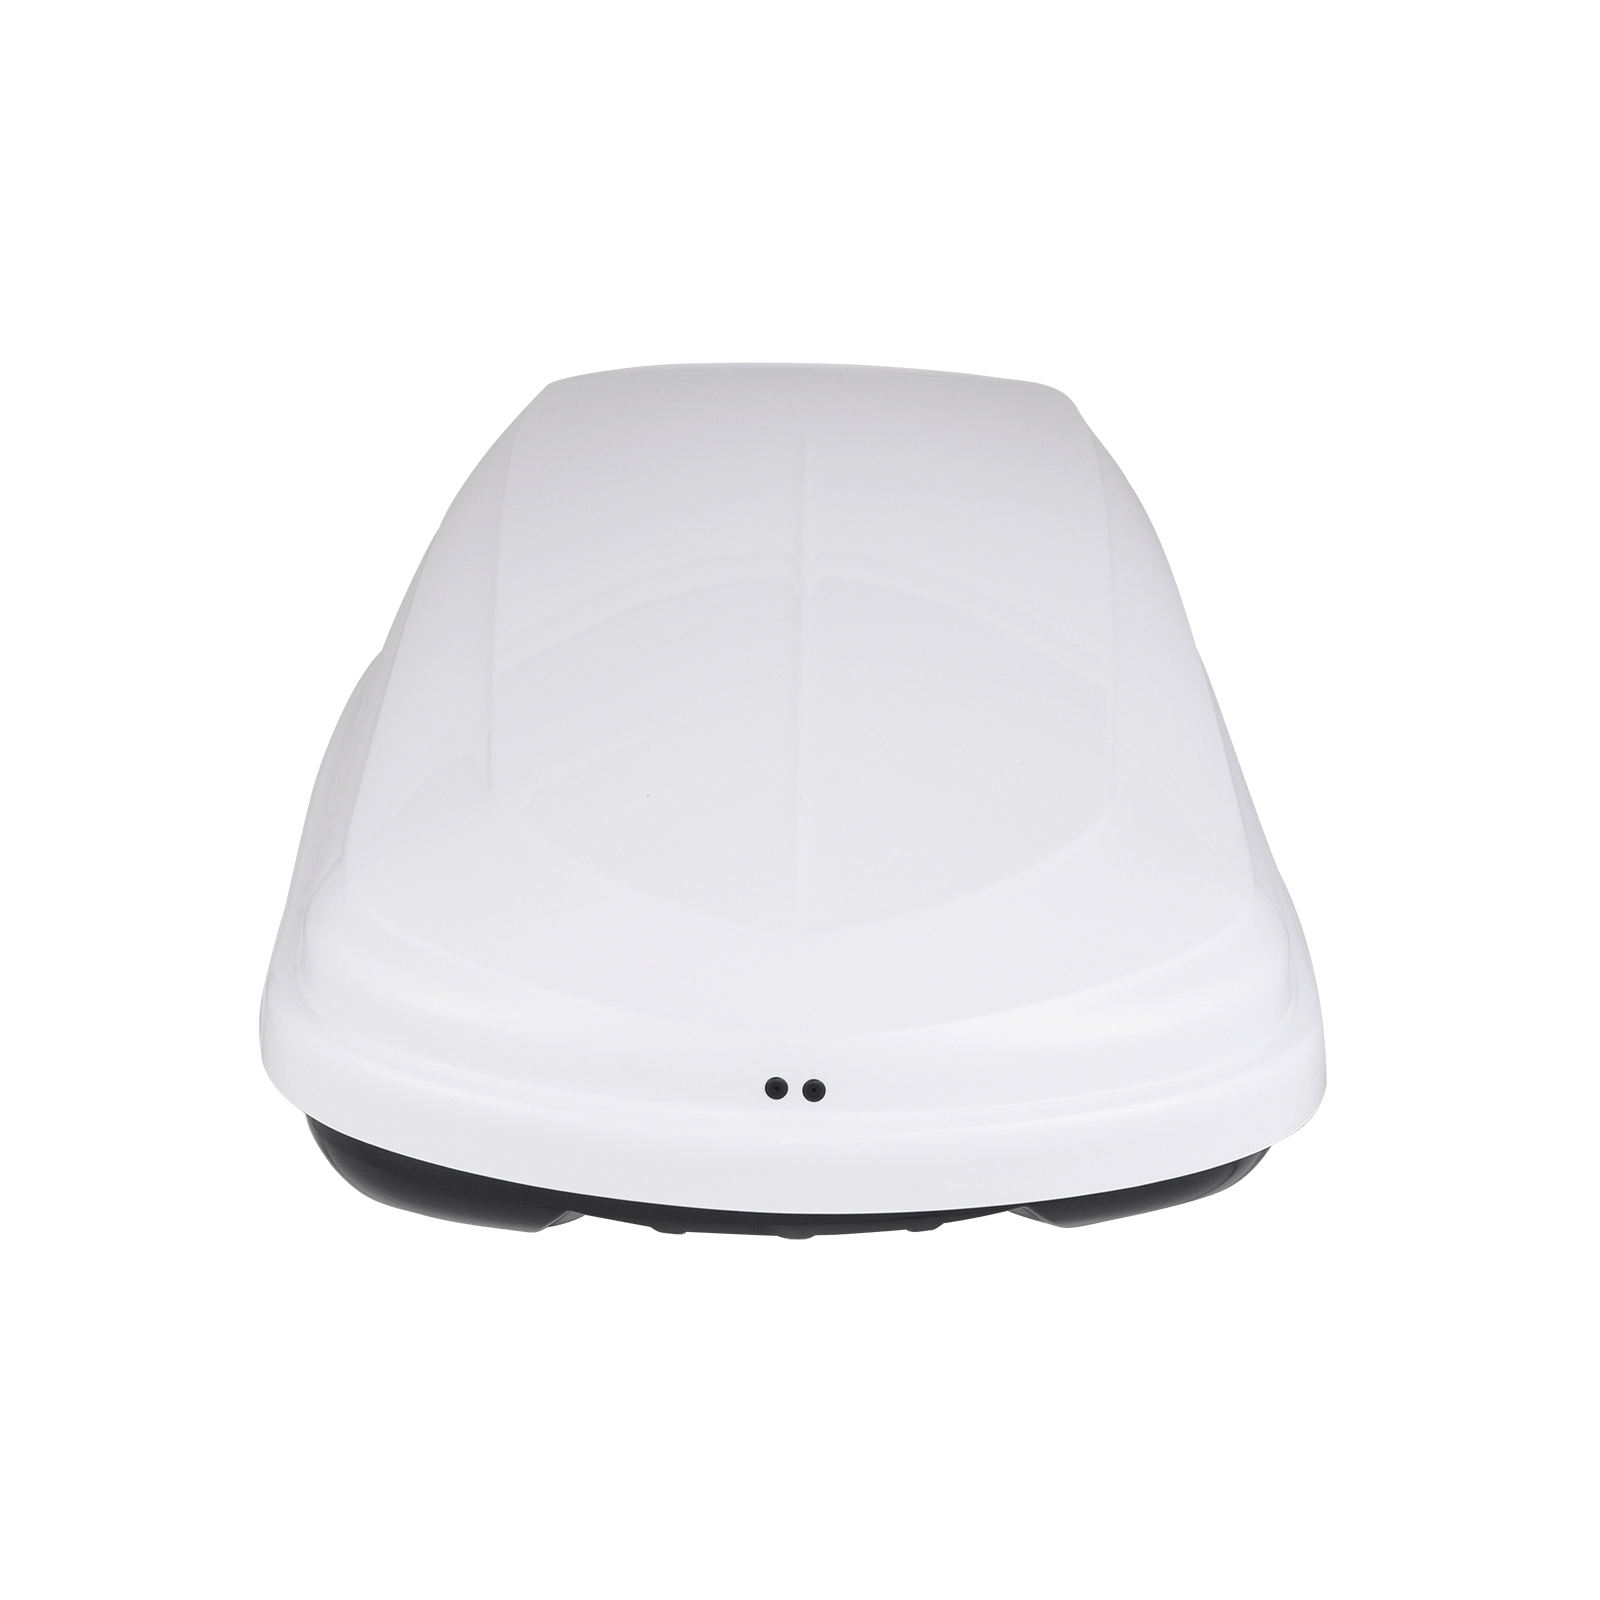 Dachbox Hapro Traxer 6.6 weiß - Bild 3